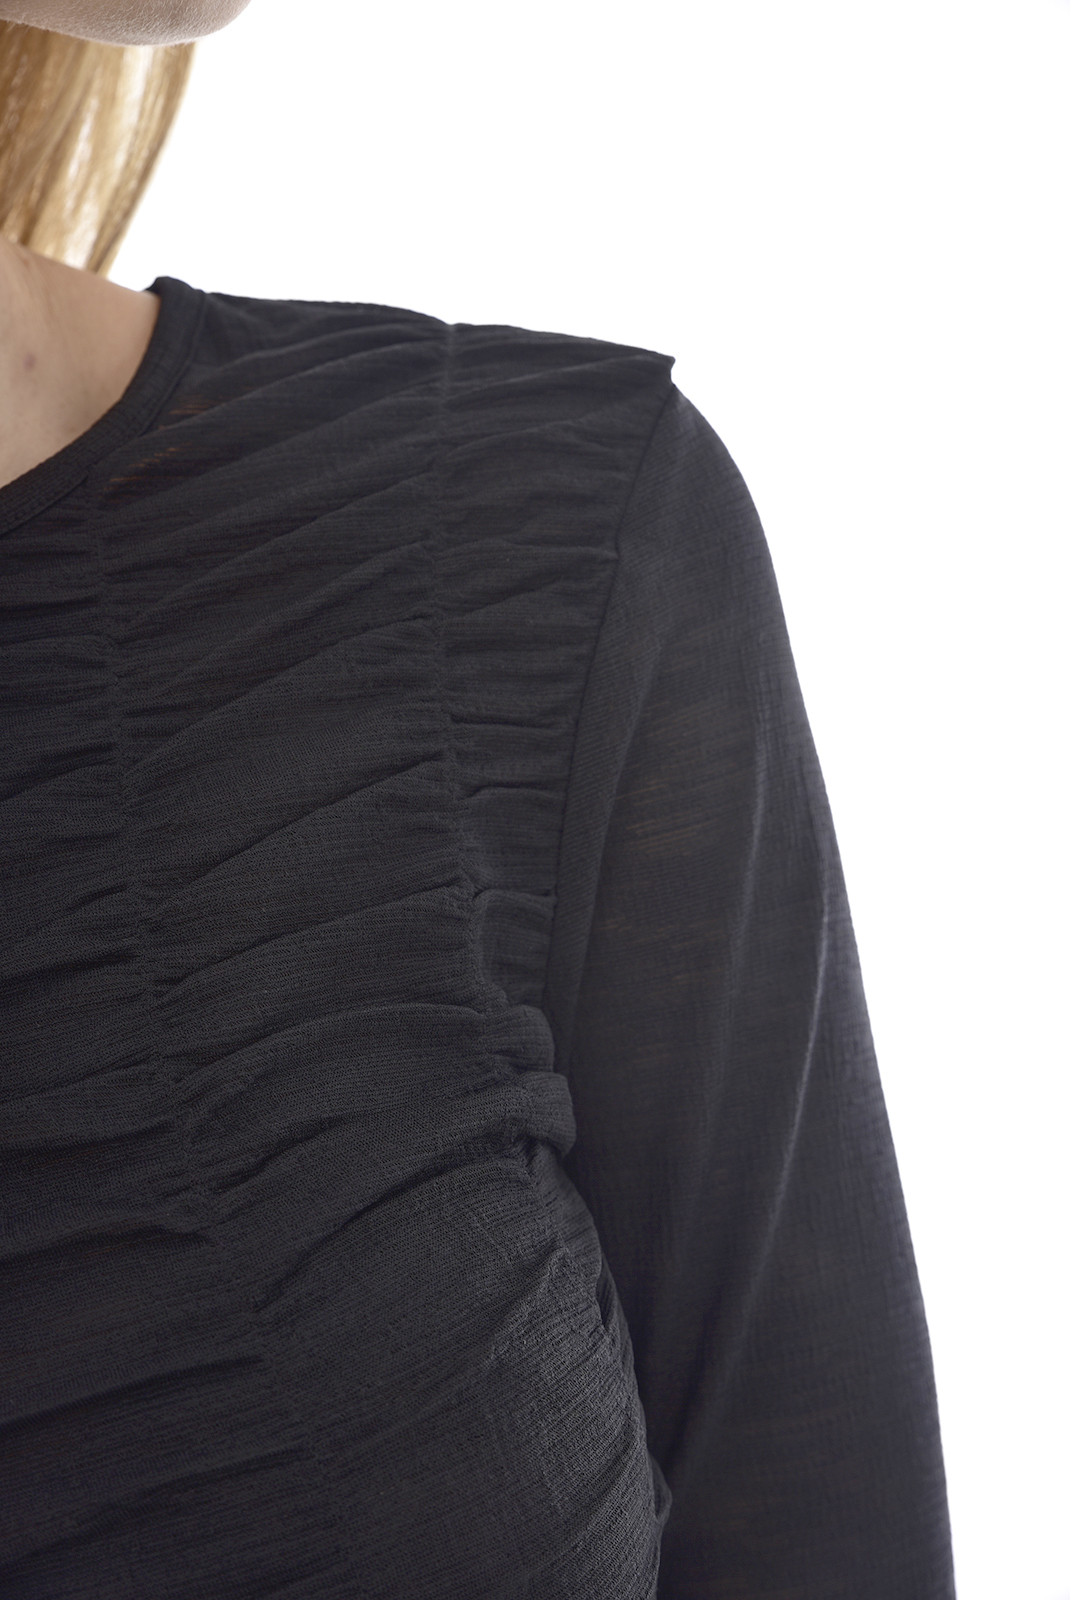 Top   Vero moda GOFRET CRINCKLED L/S Black